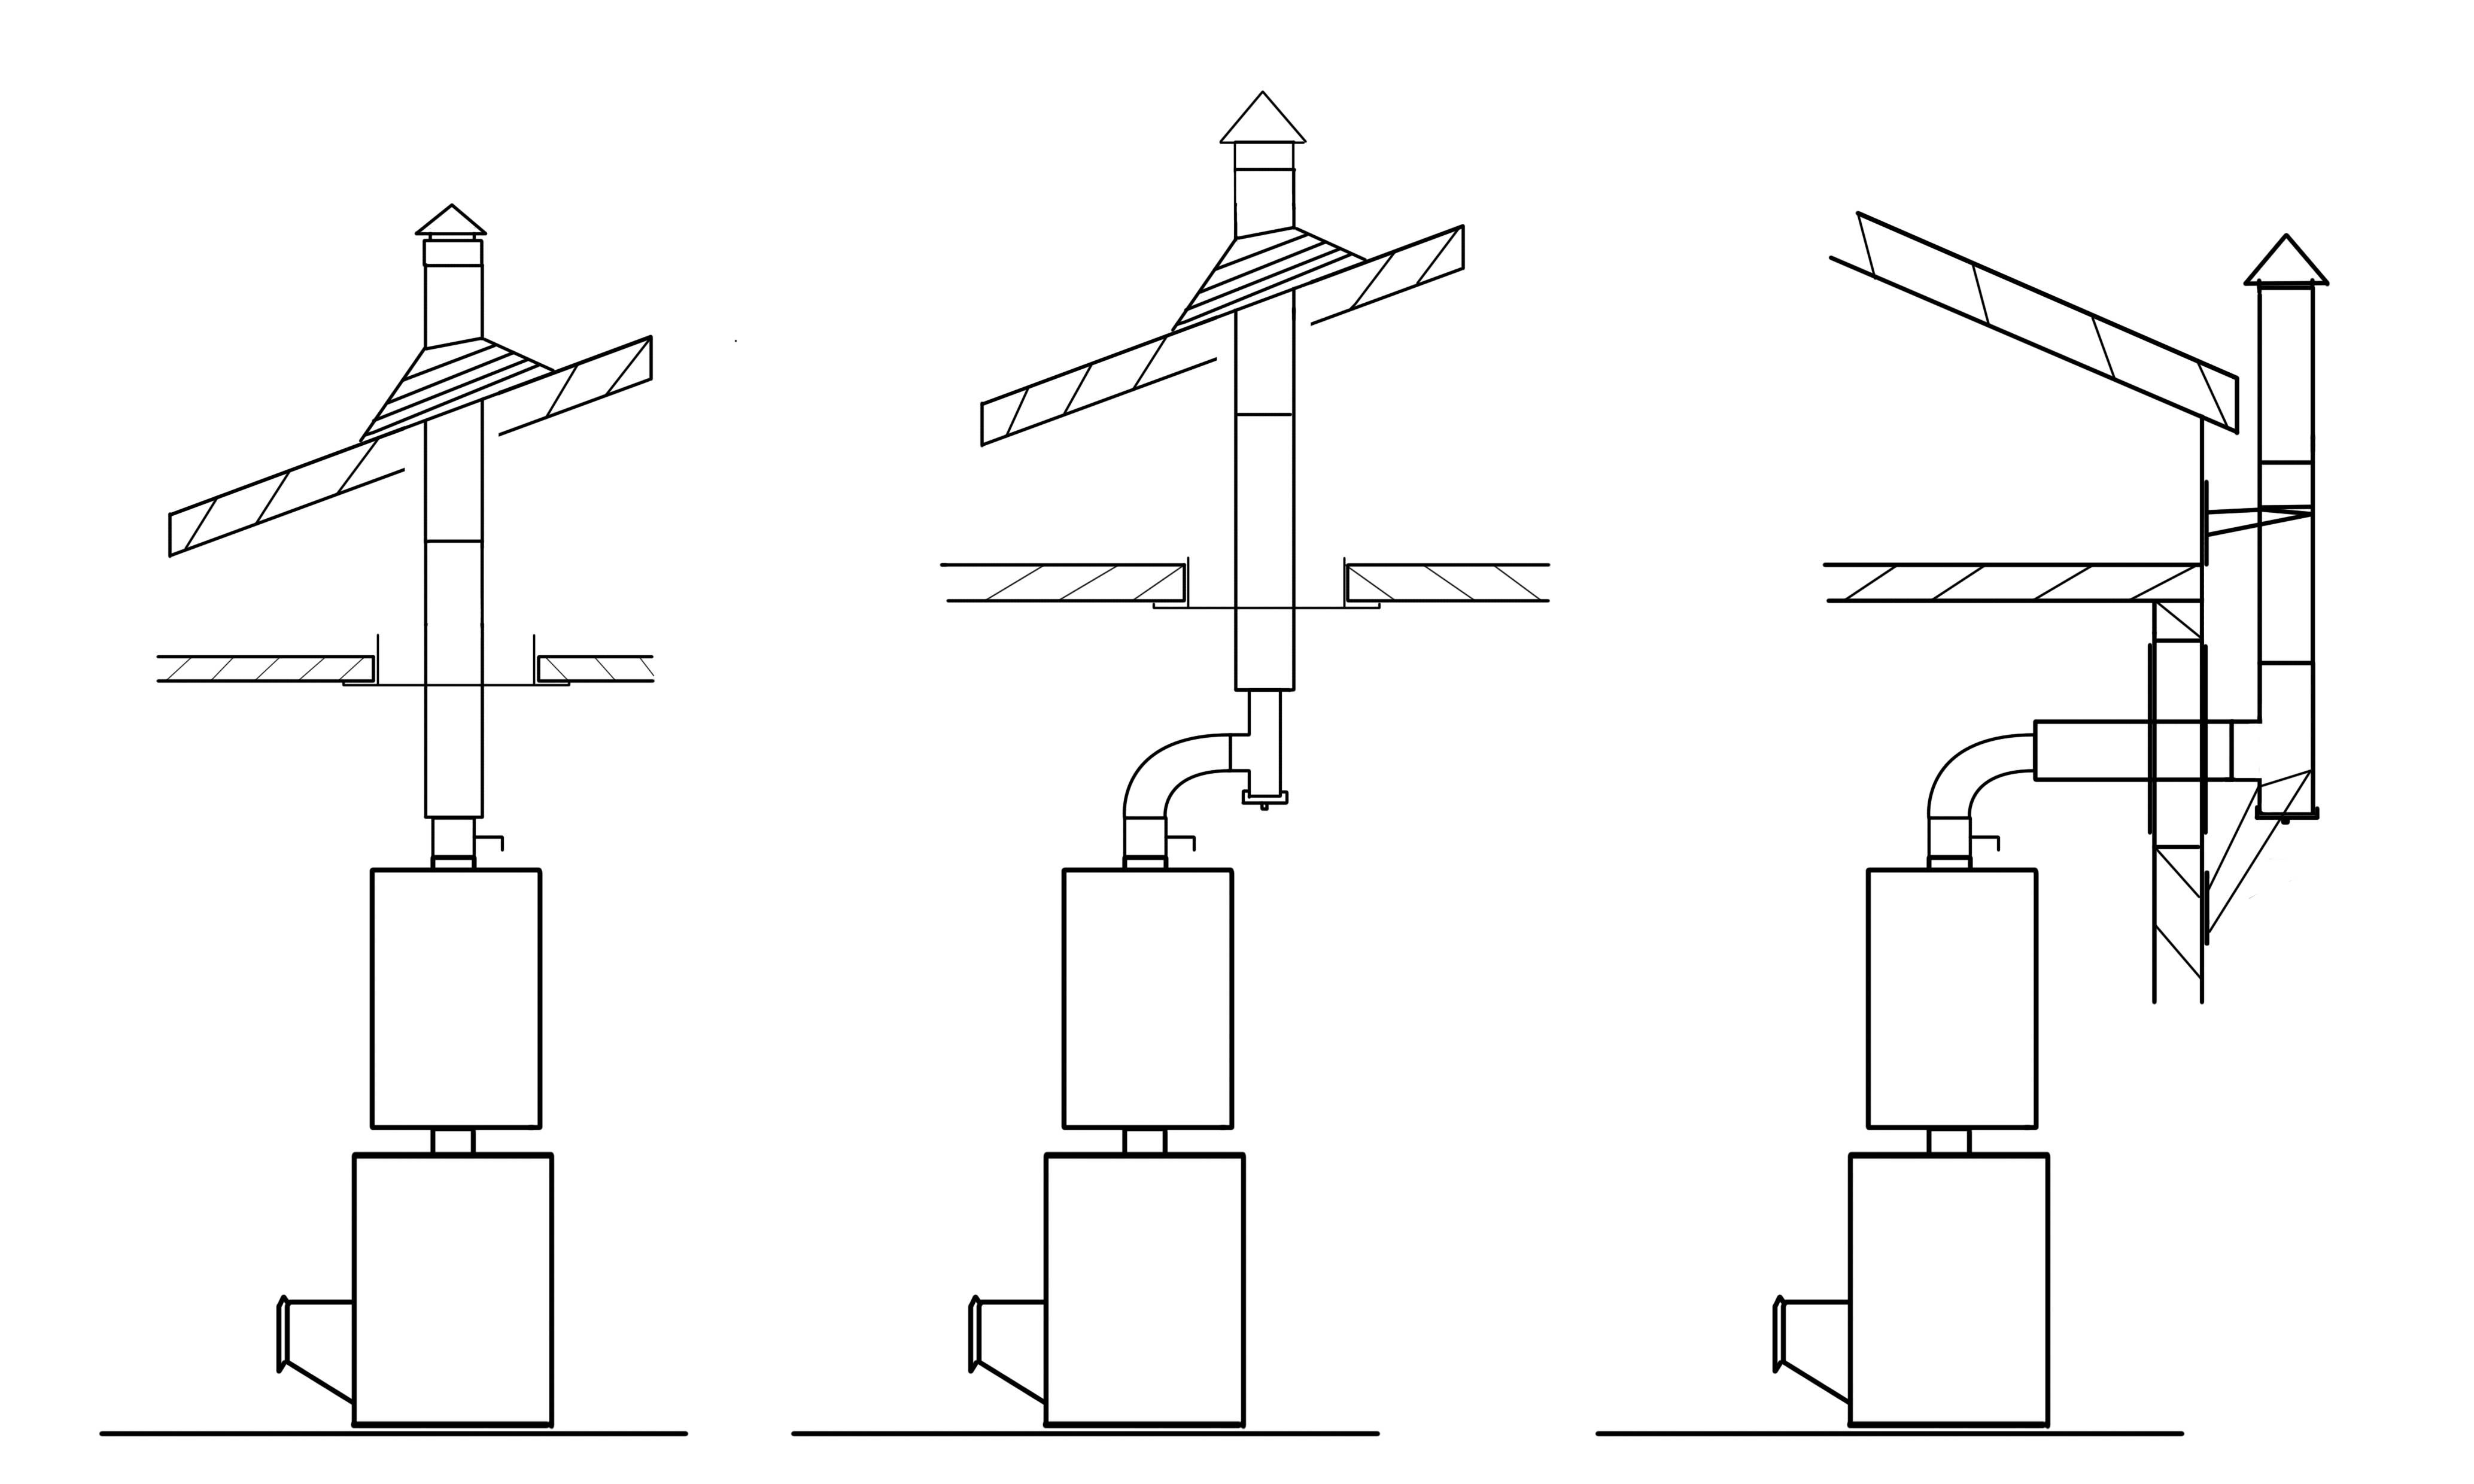 Сэндвич дымоход своими руками - схема монтажа + видео